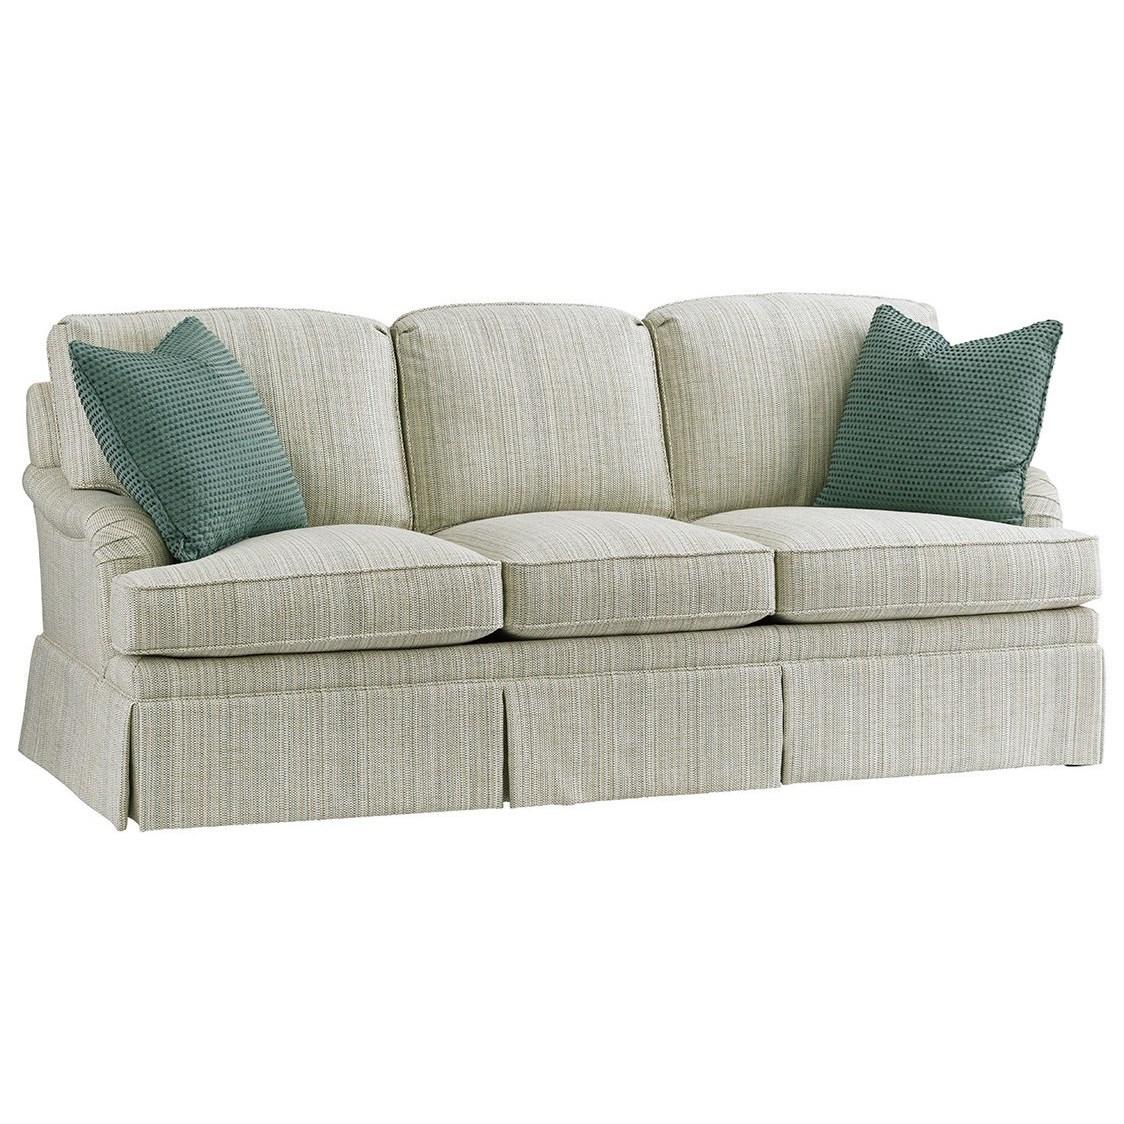 Customizable McConnell Sofa